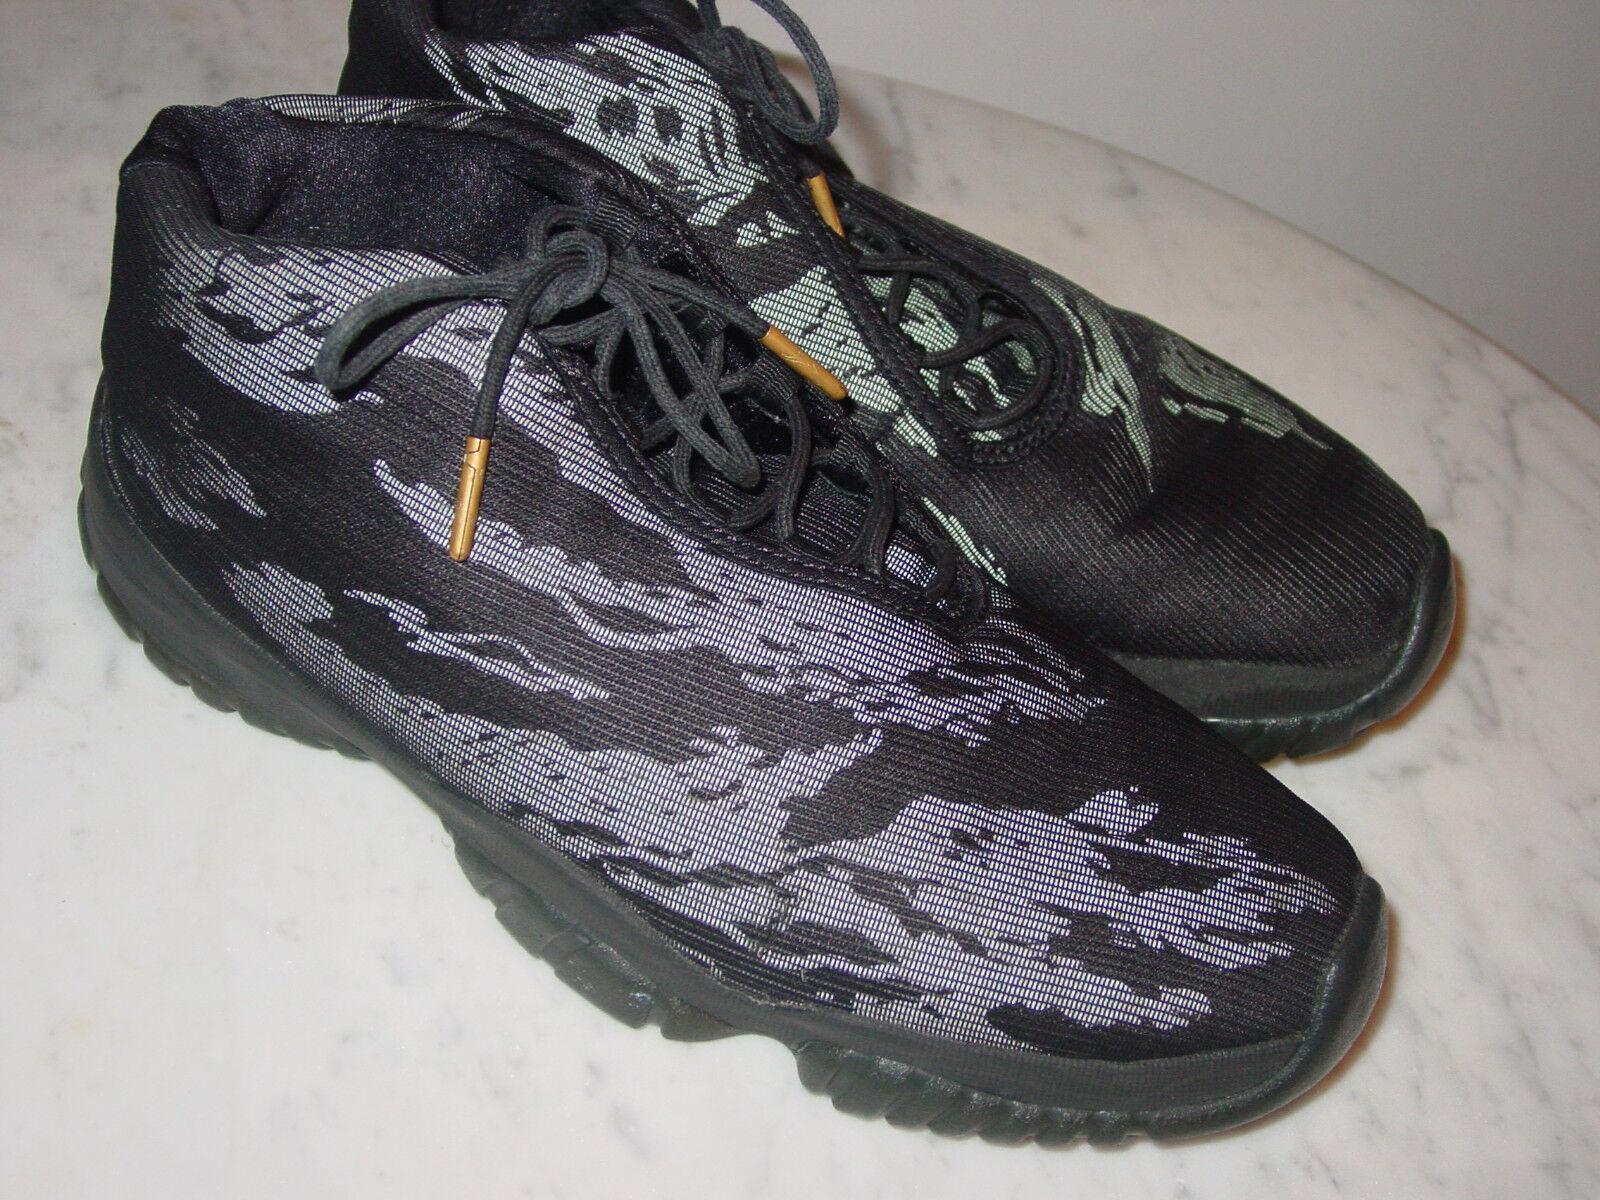 2014 Mens Nike Air Jordan Future 3M Reflective Tiger Black/Gold Shoes  Size 10